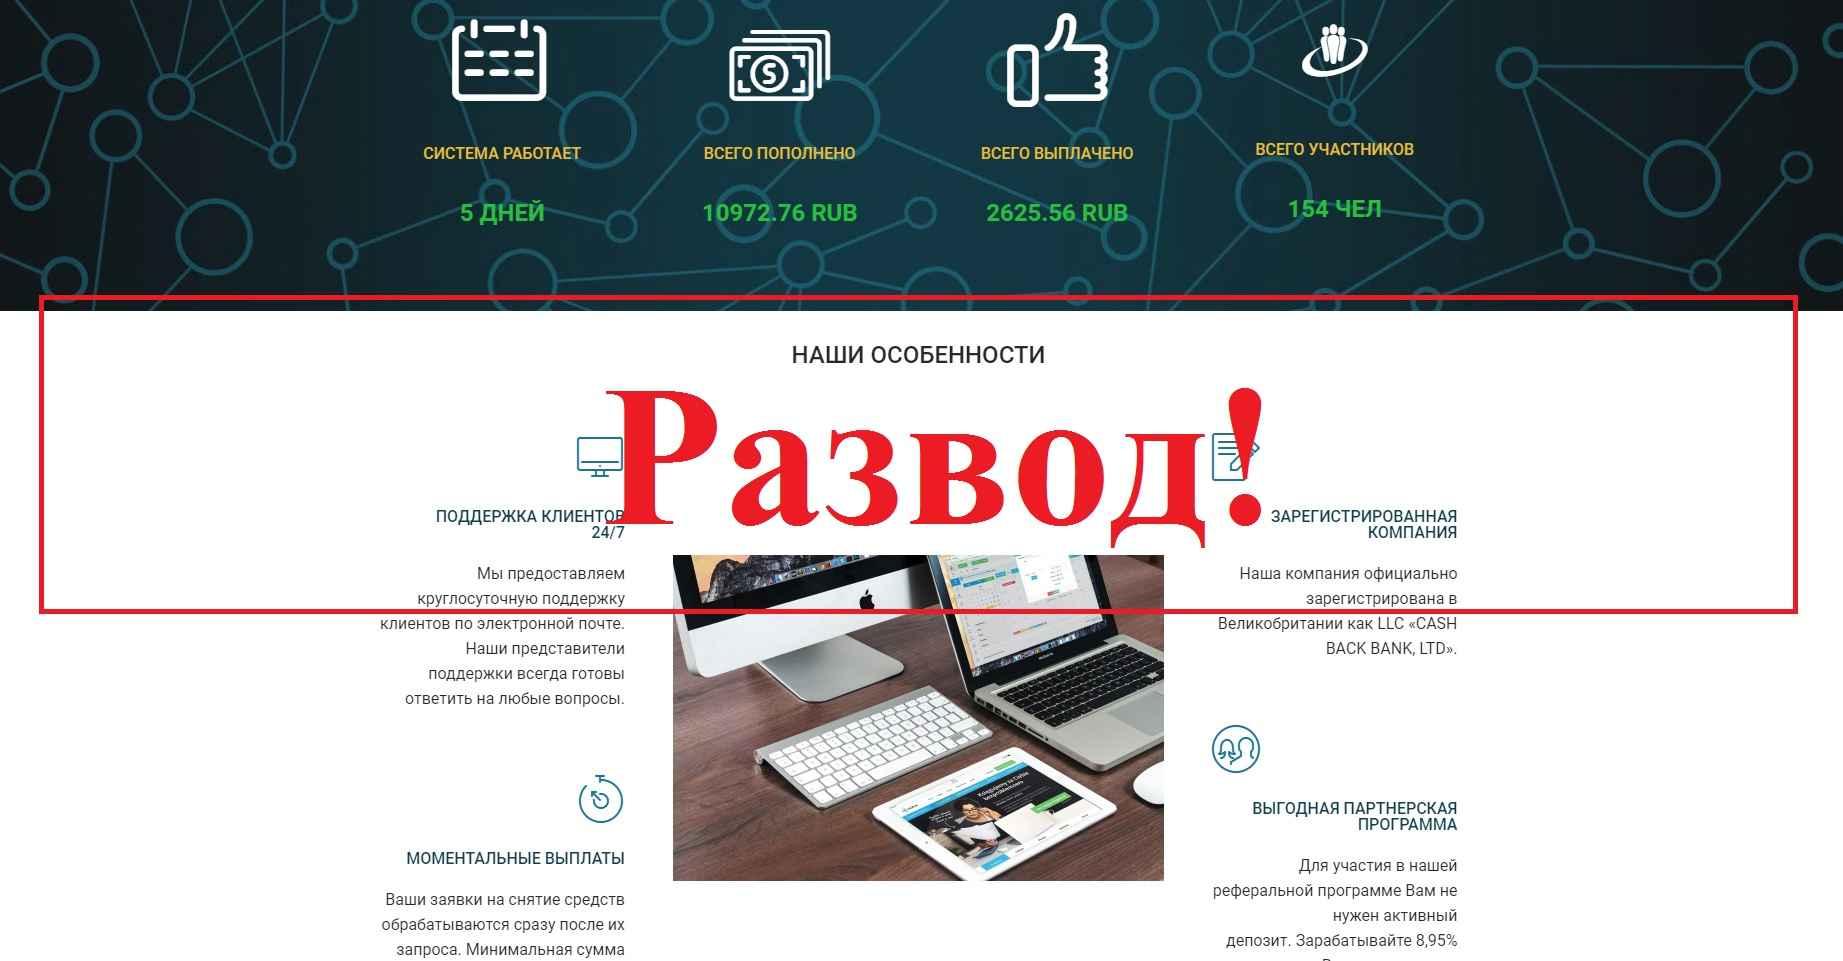 Cash Back Bank - отзывы и обзор cashbackbank.site